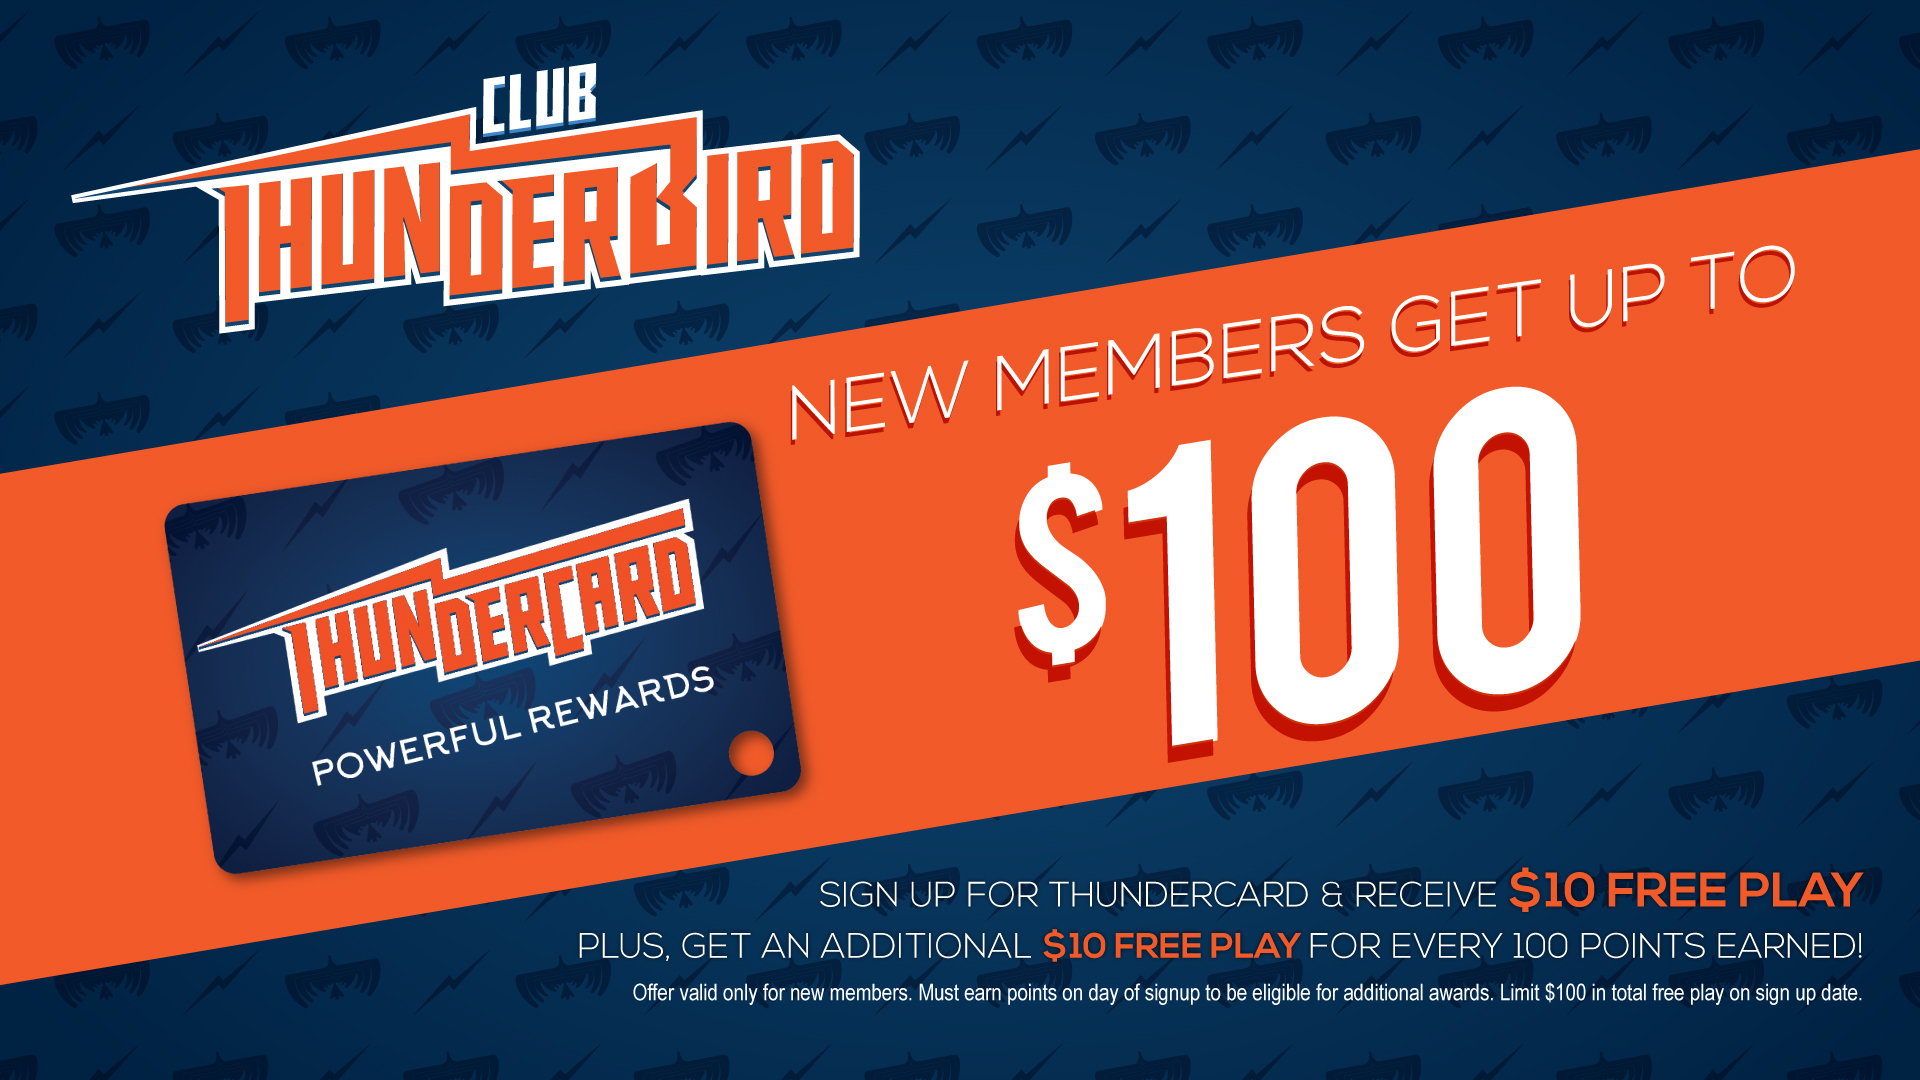 TBC-DigitalSlides_ClubThunderbird